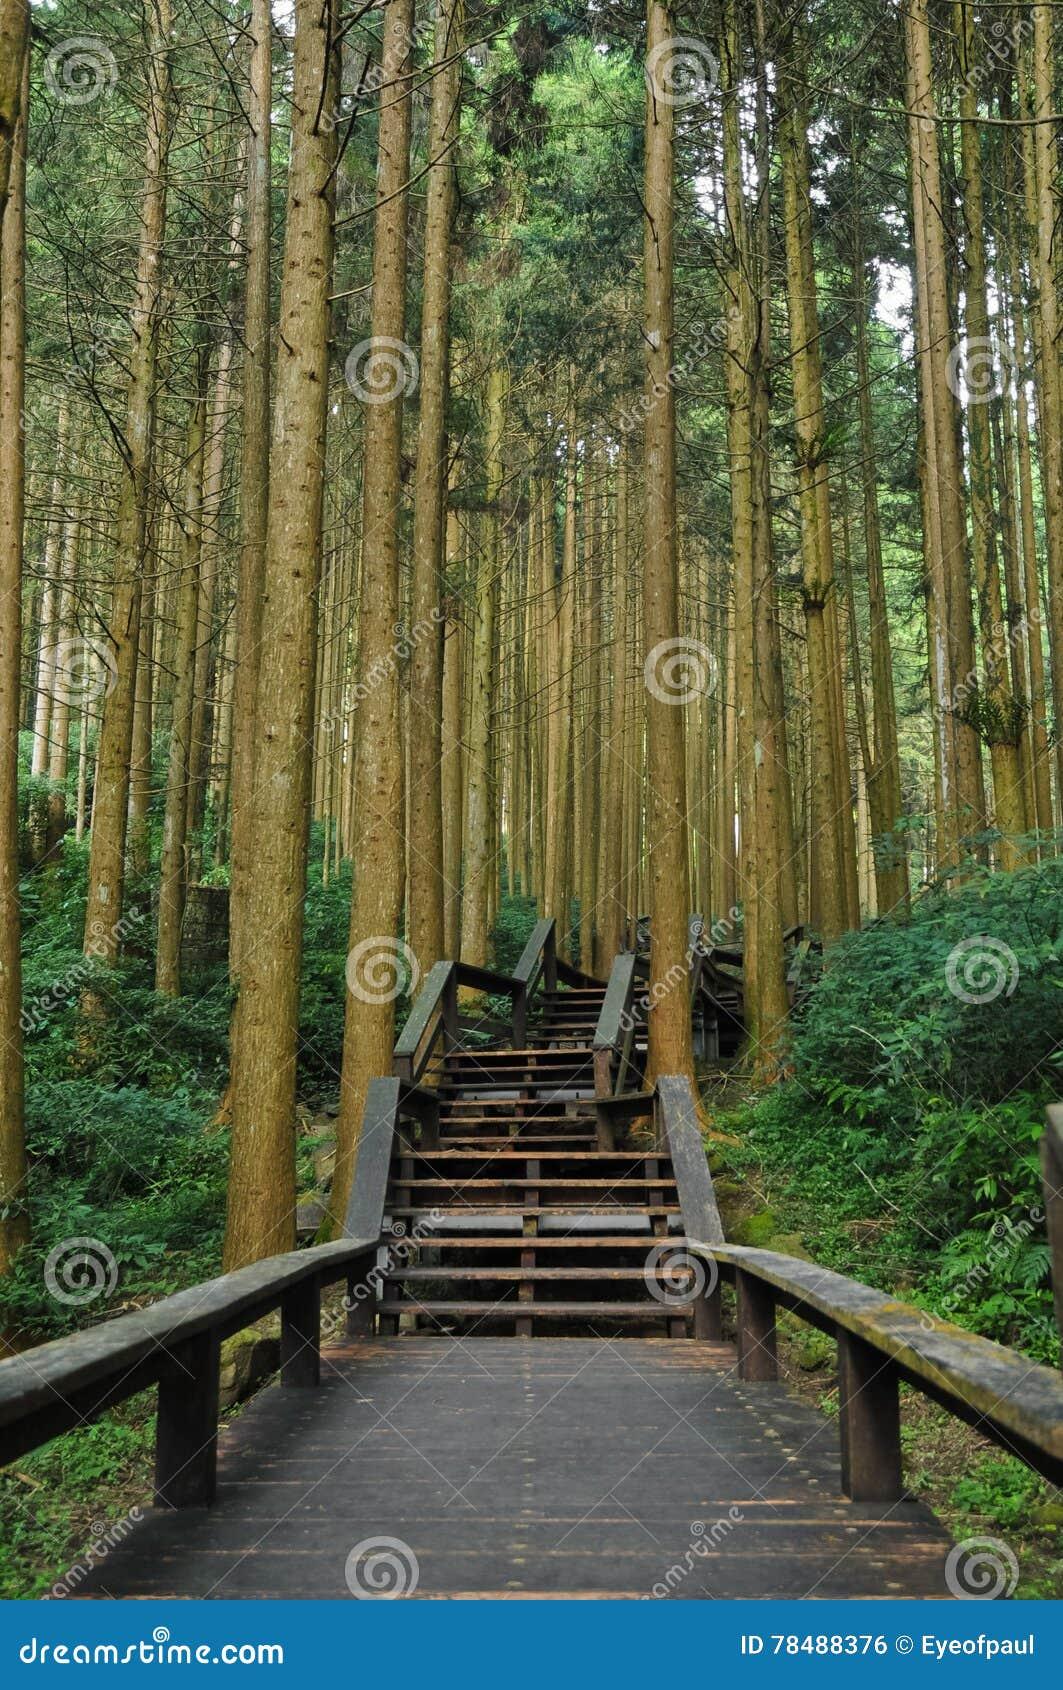 escaleras al bosque antiguo de bamb